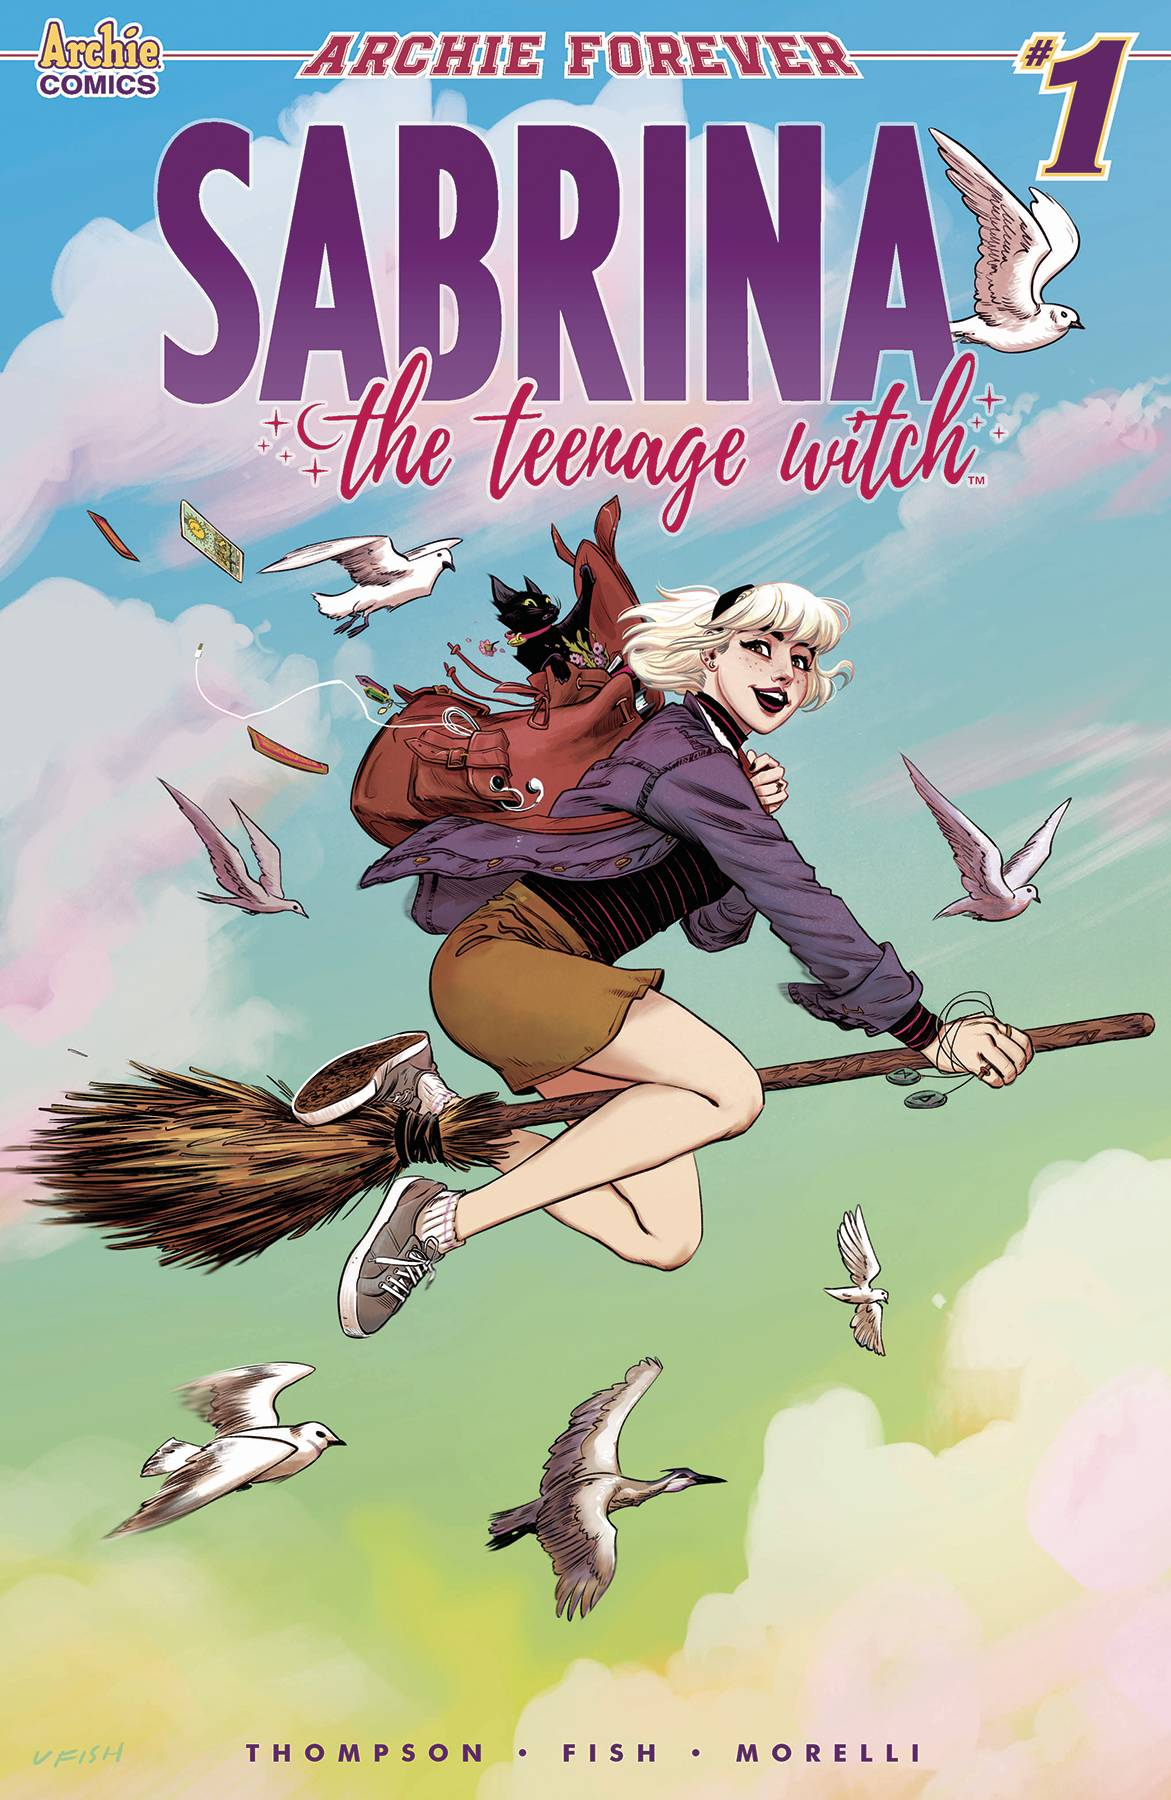 SABRINA TEENAGE WITCH #1